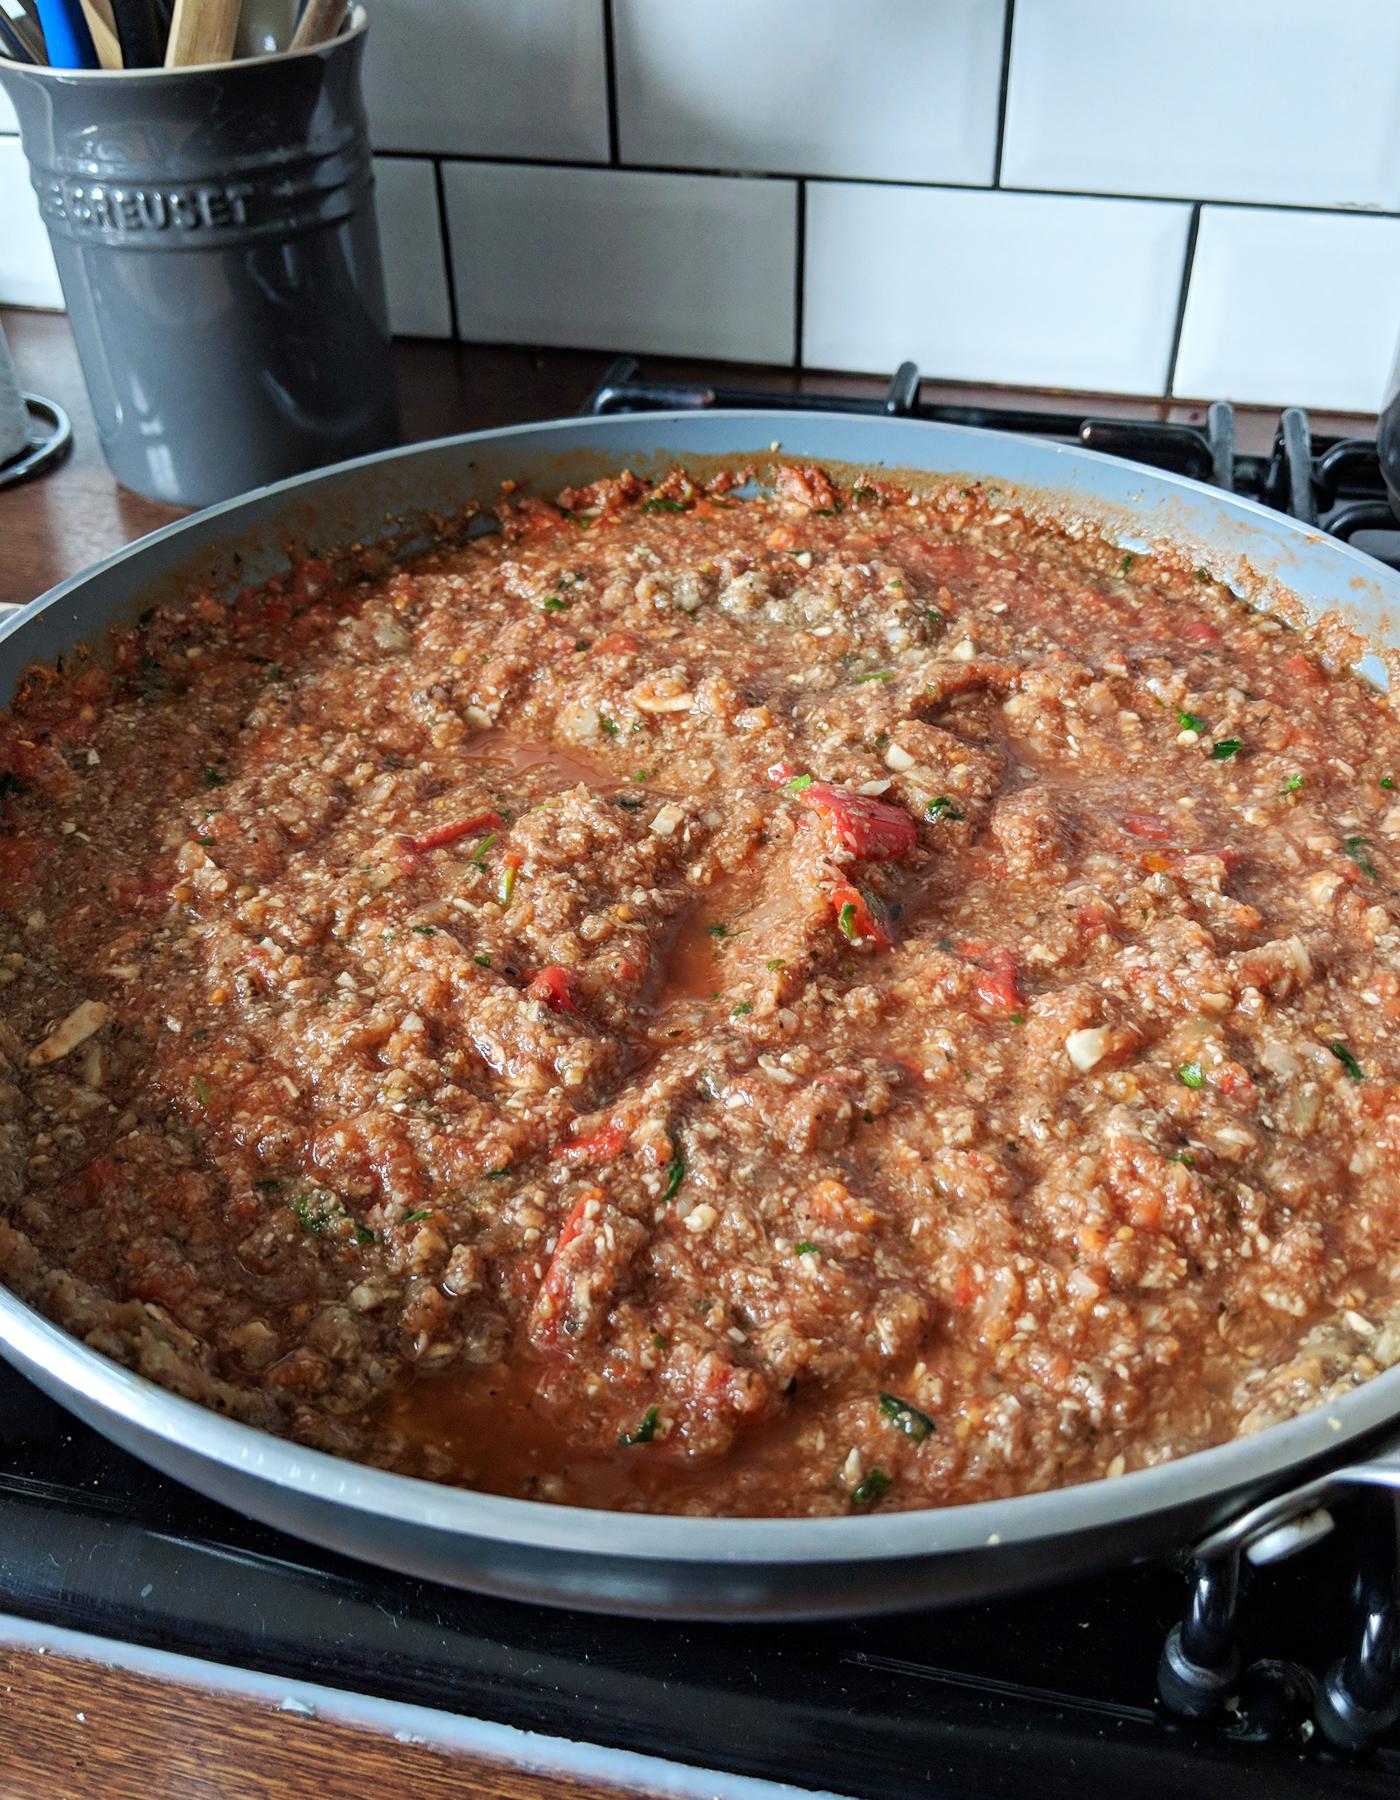 Homemade lasagne sauce